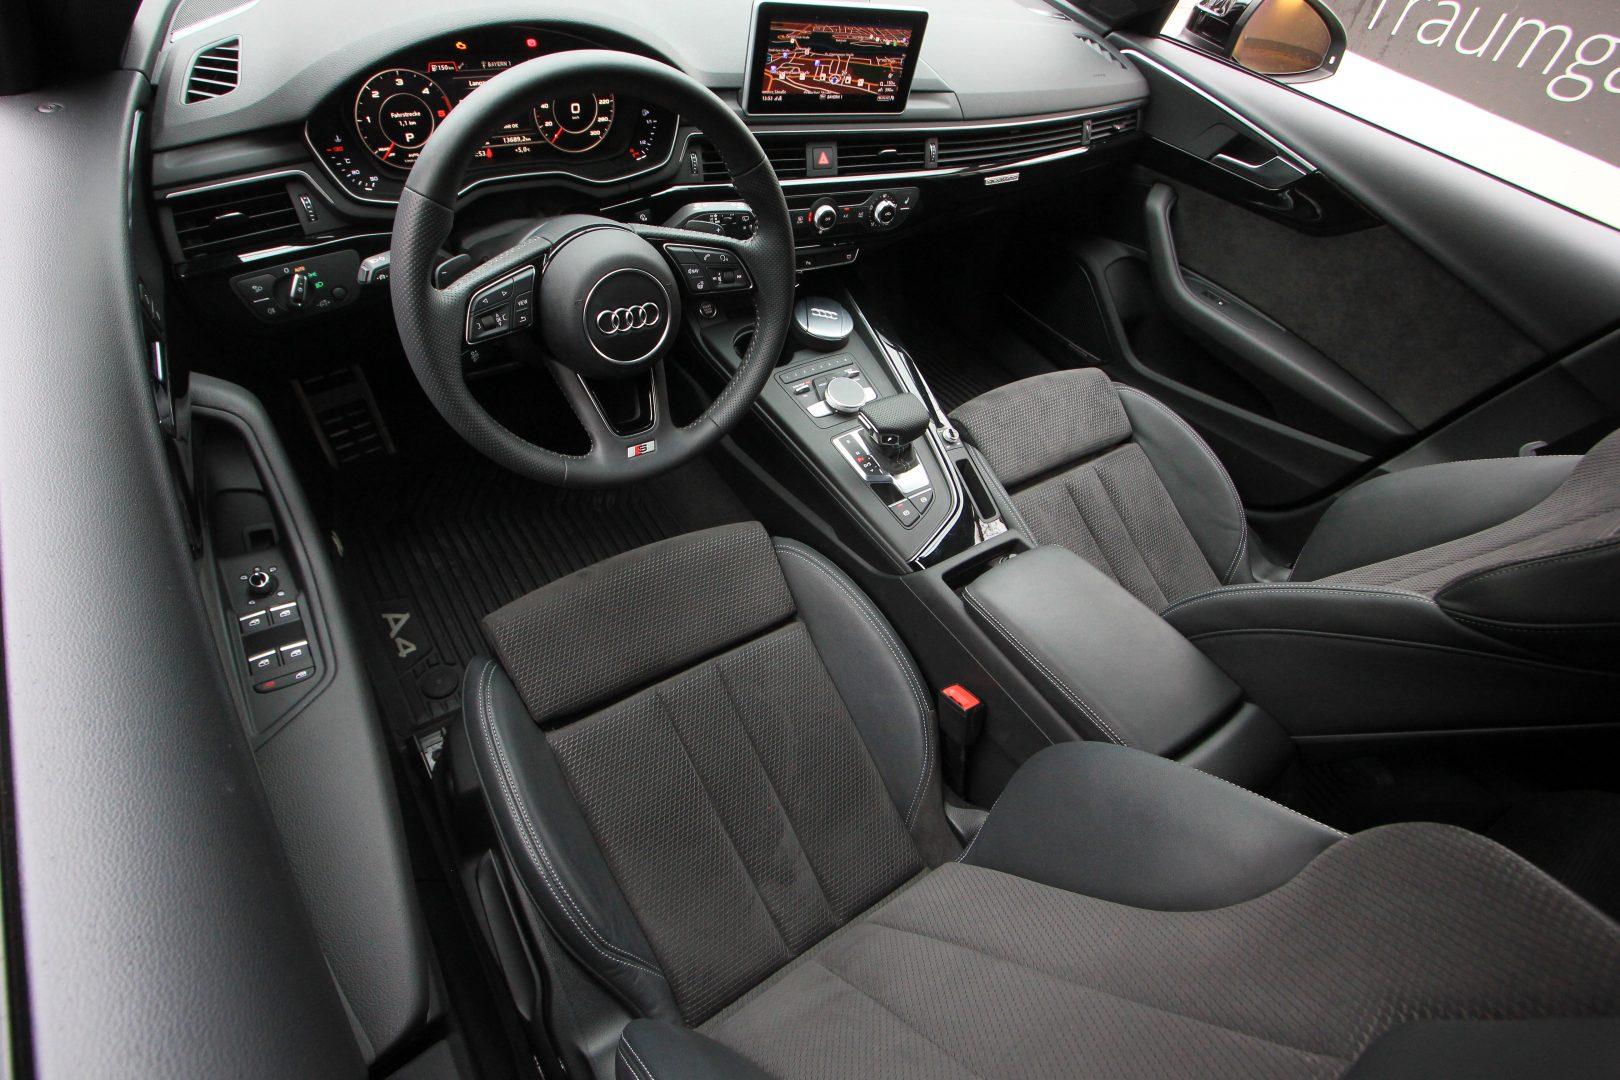 AIL Audi A4 Avant S line Sport / Plus quattro 3.0 TDI 9